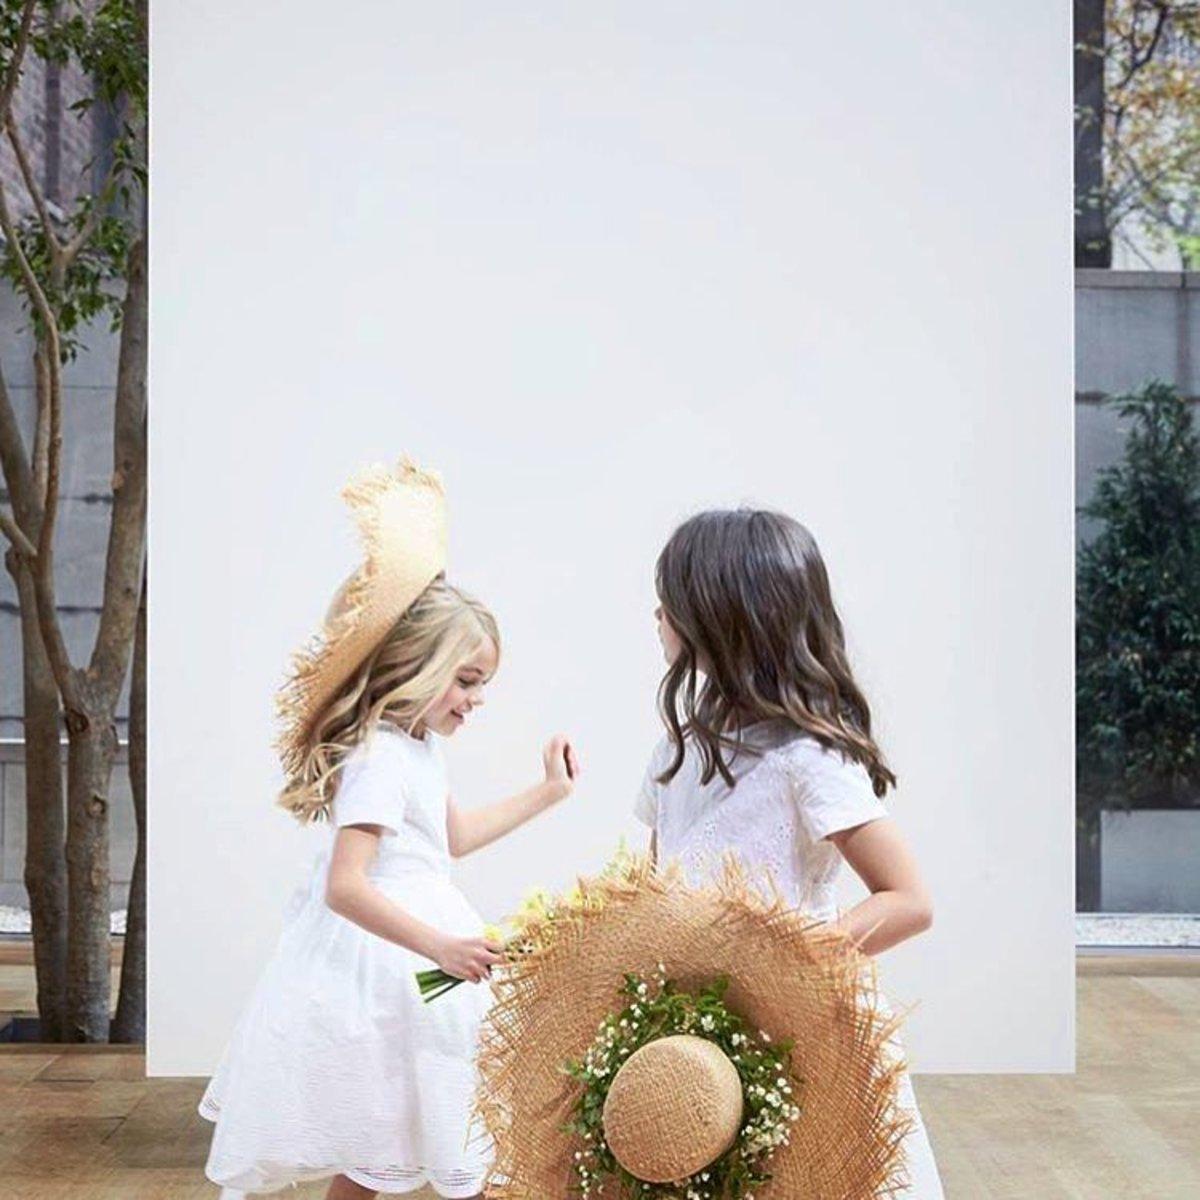 Flower girls with Gigi Burris straw hats worn for Oscar de la Renta Bridal's Spring 2017 runway show. Photo: @gigiburris/Instagram